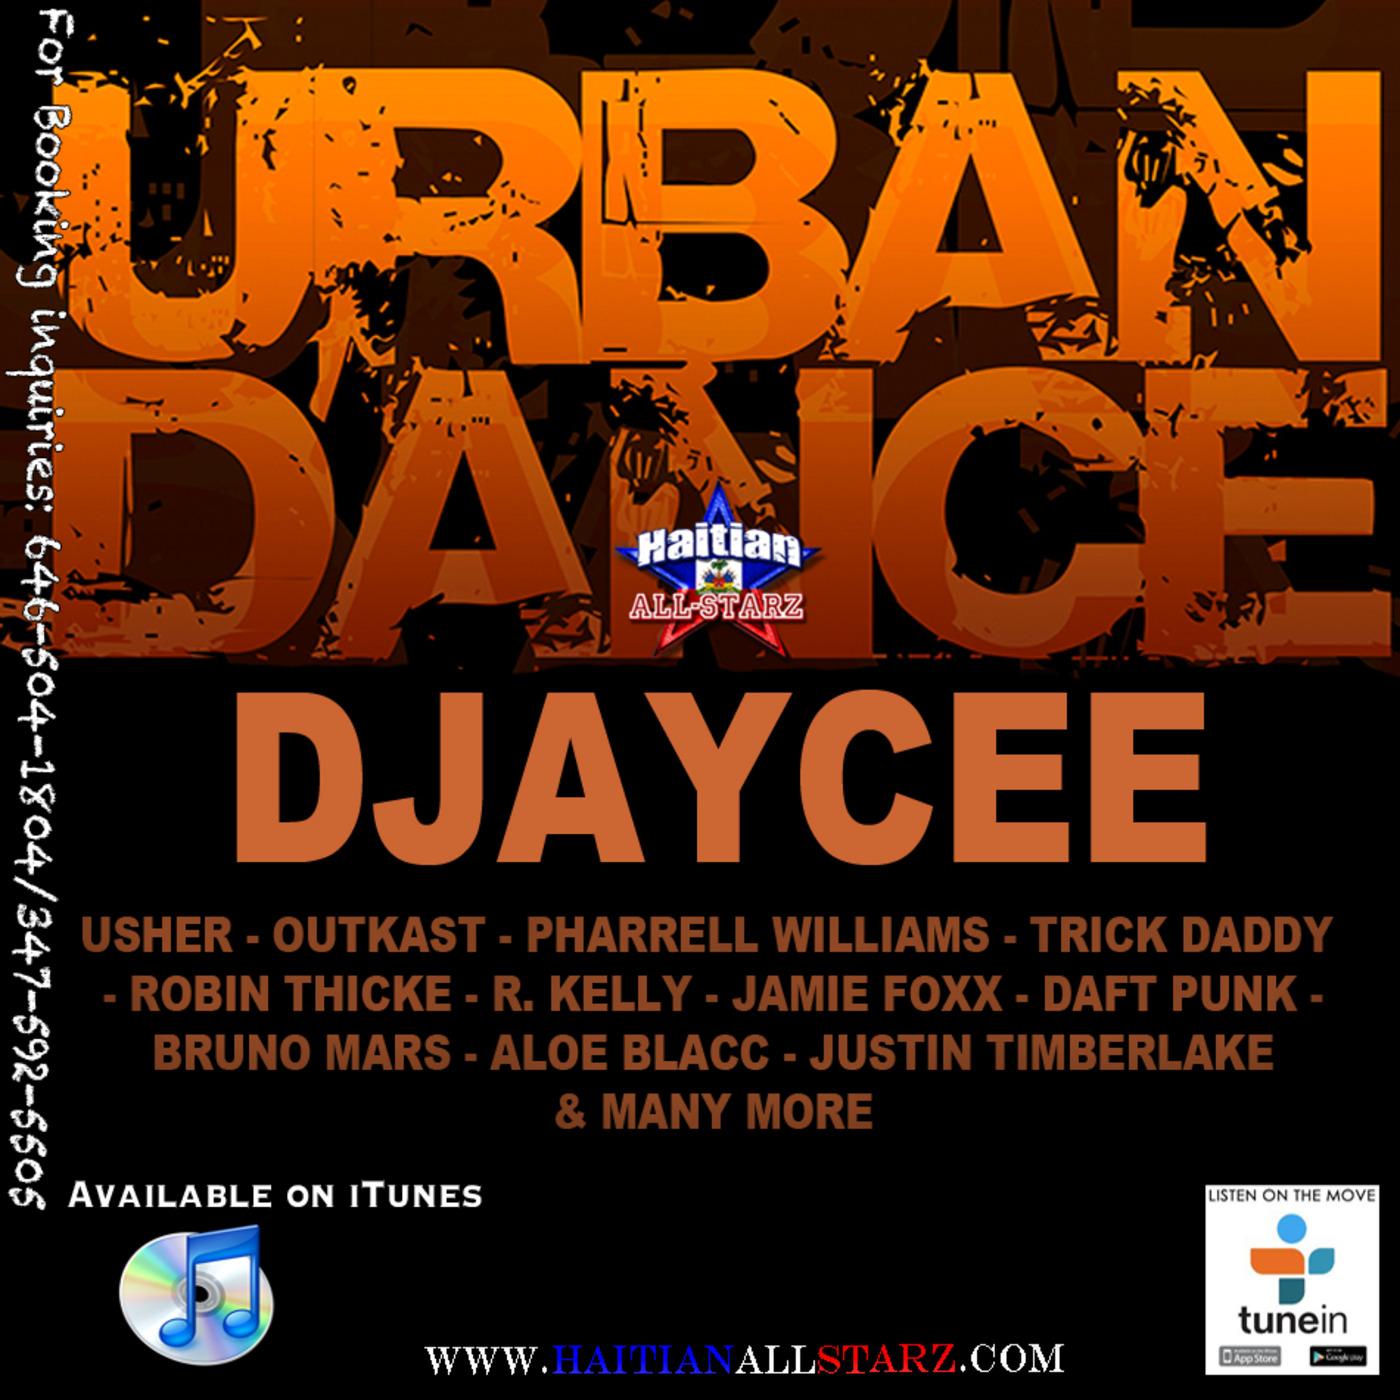 Dancing With Haitians At La Fete De >> Urban Dance R N B Mix Djaycee Haitian All